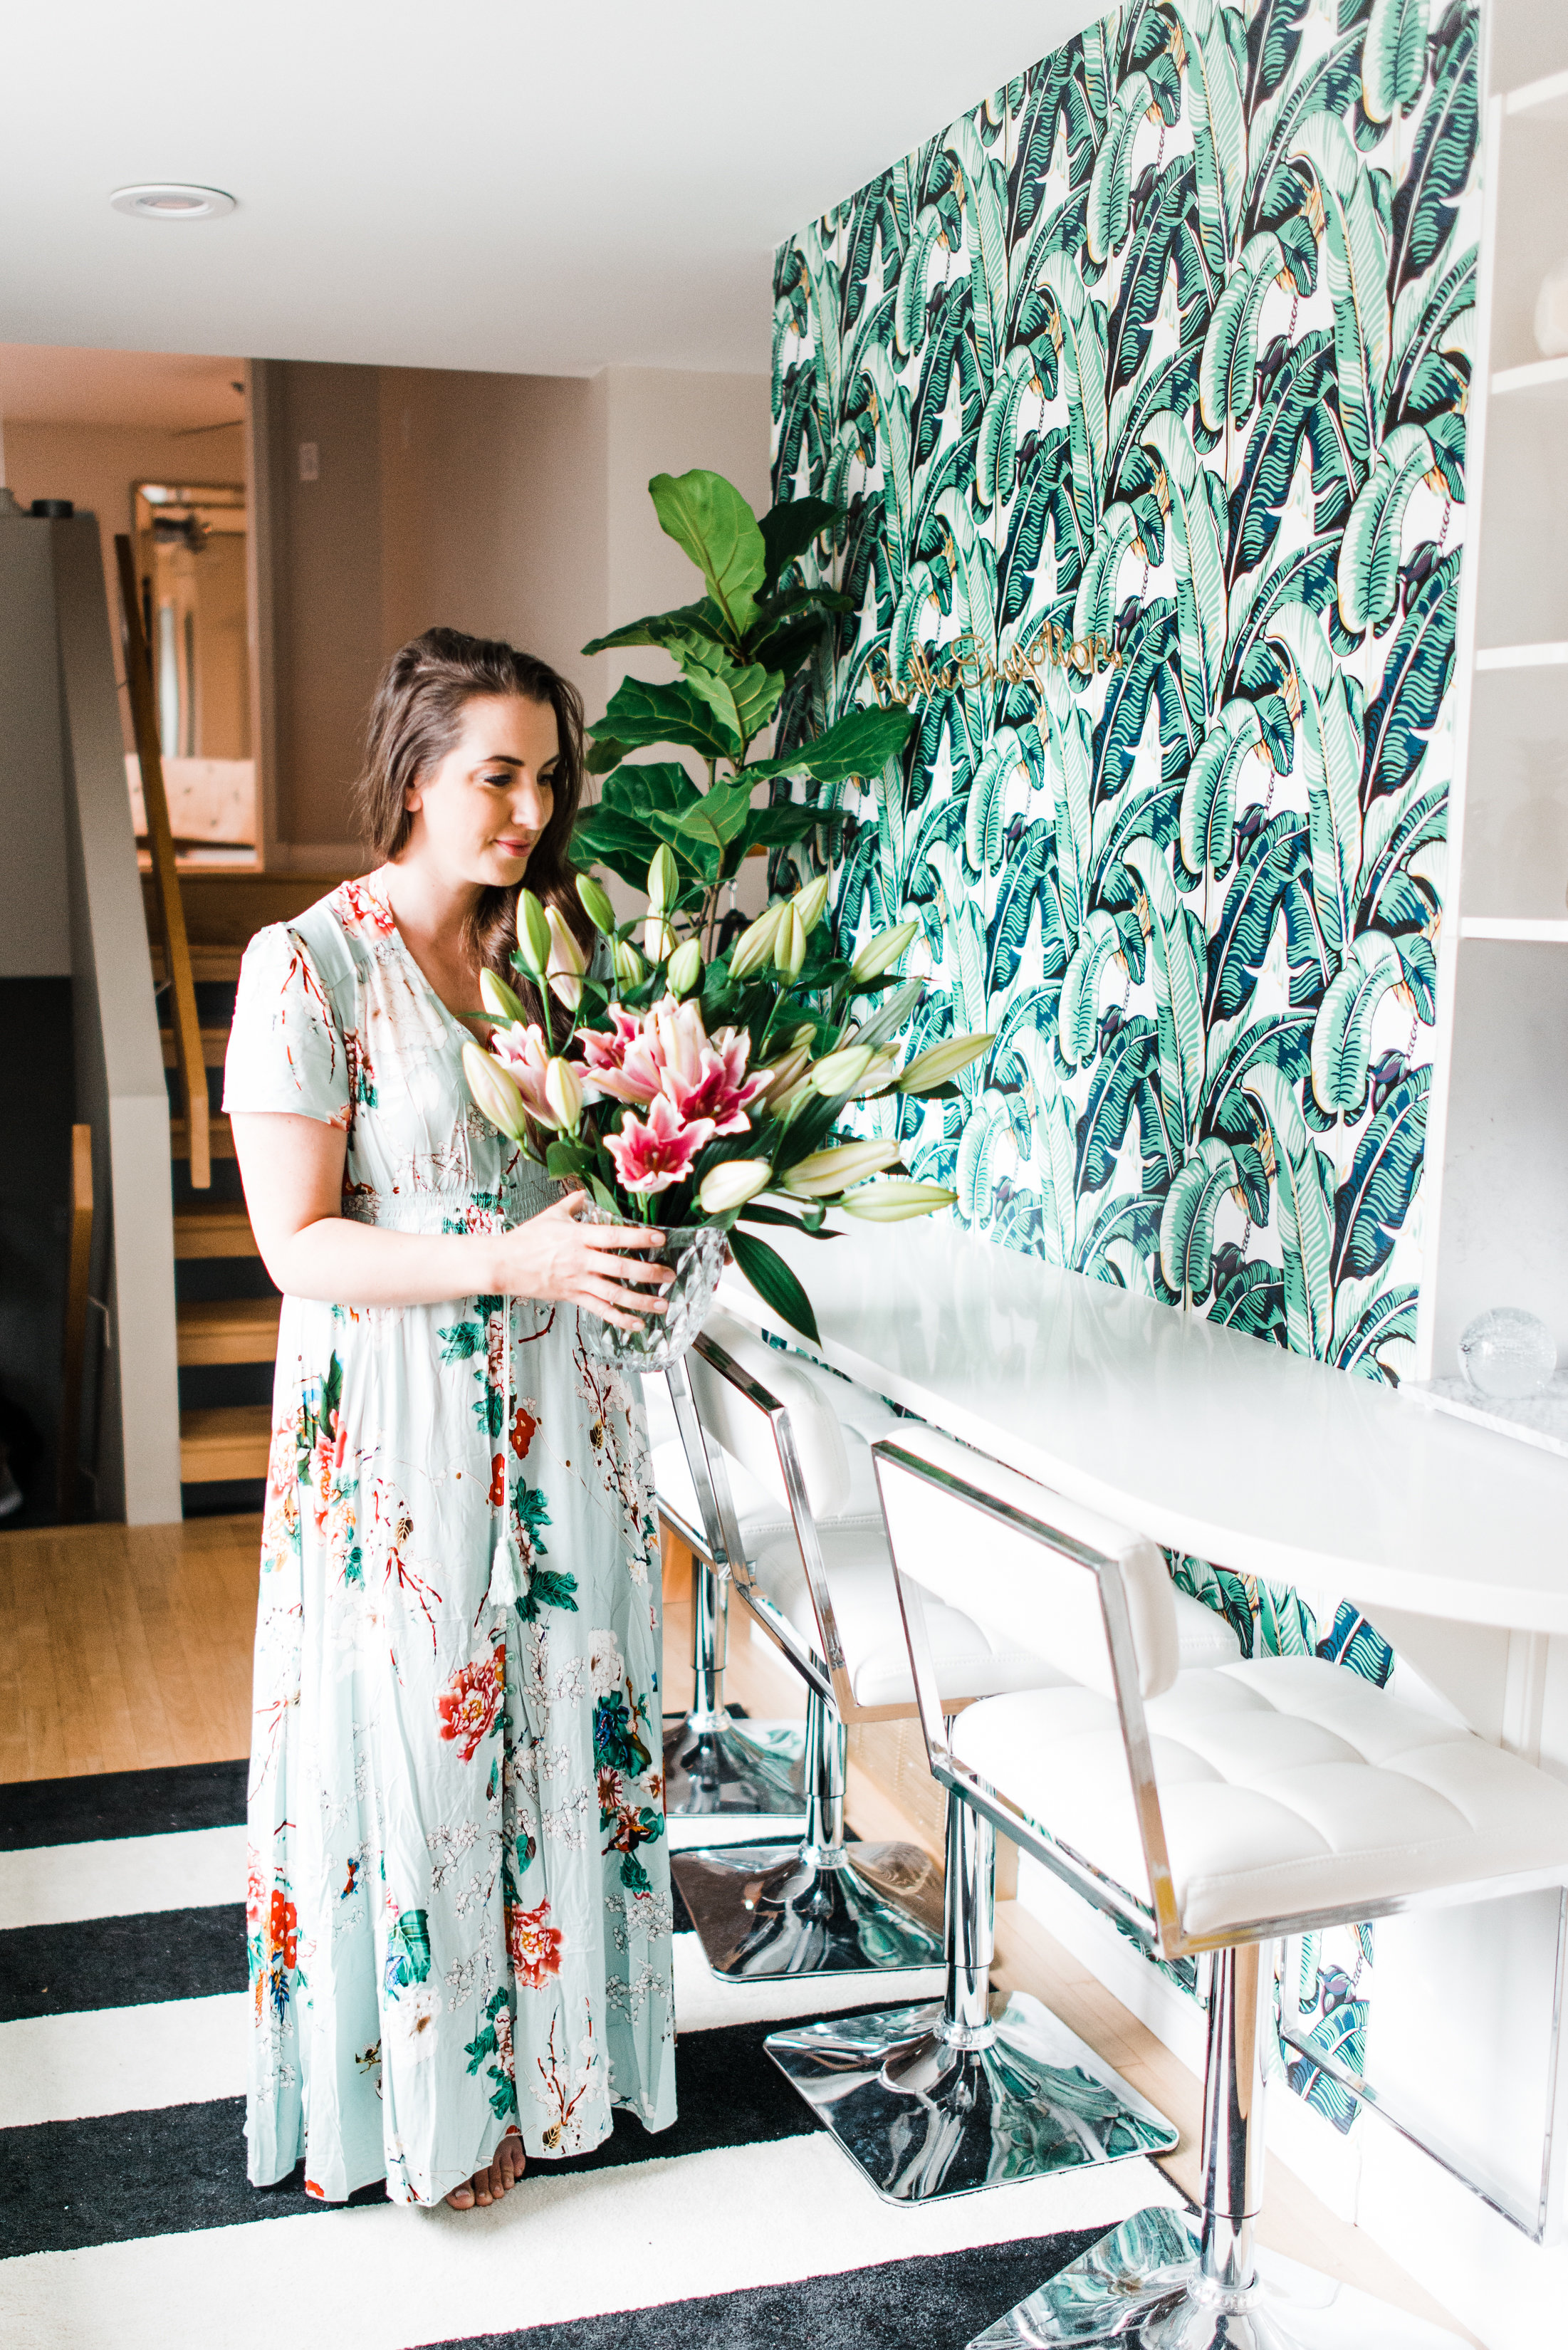 Home Decor    My 3 Easy Hostess Tips with @TheBrick    #partner ...